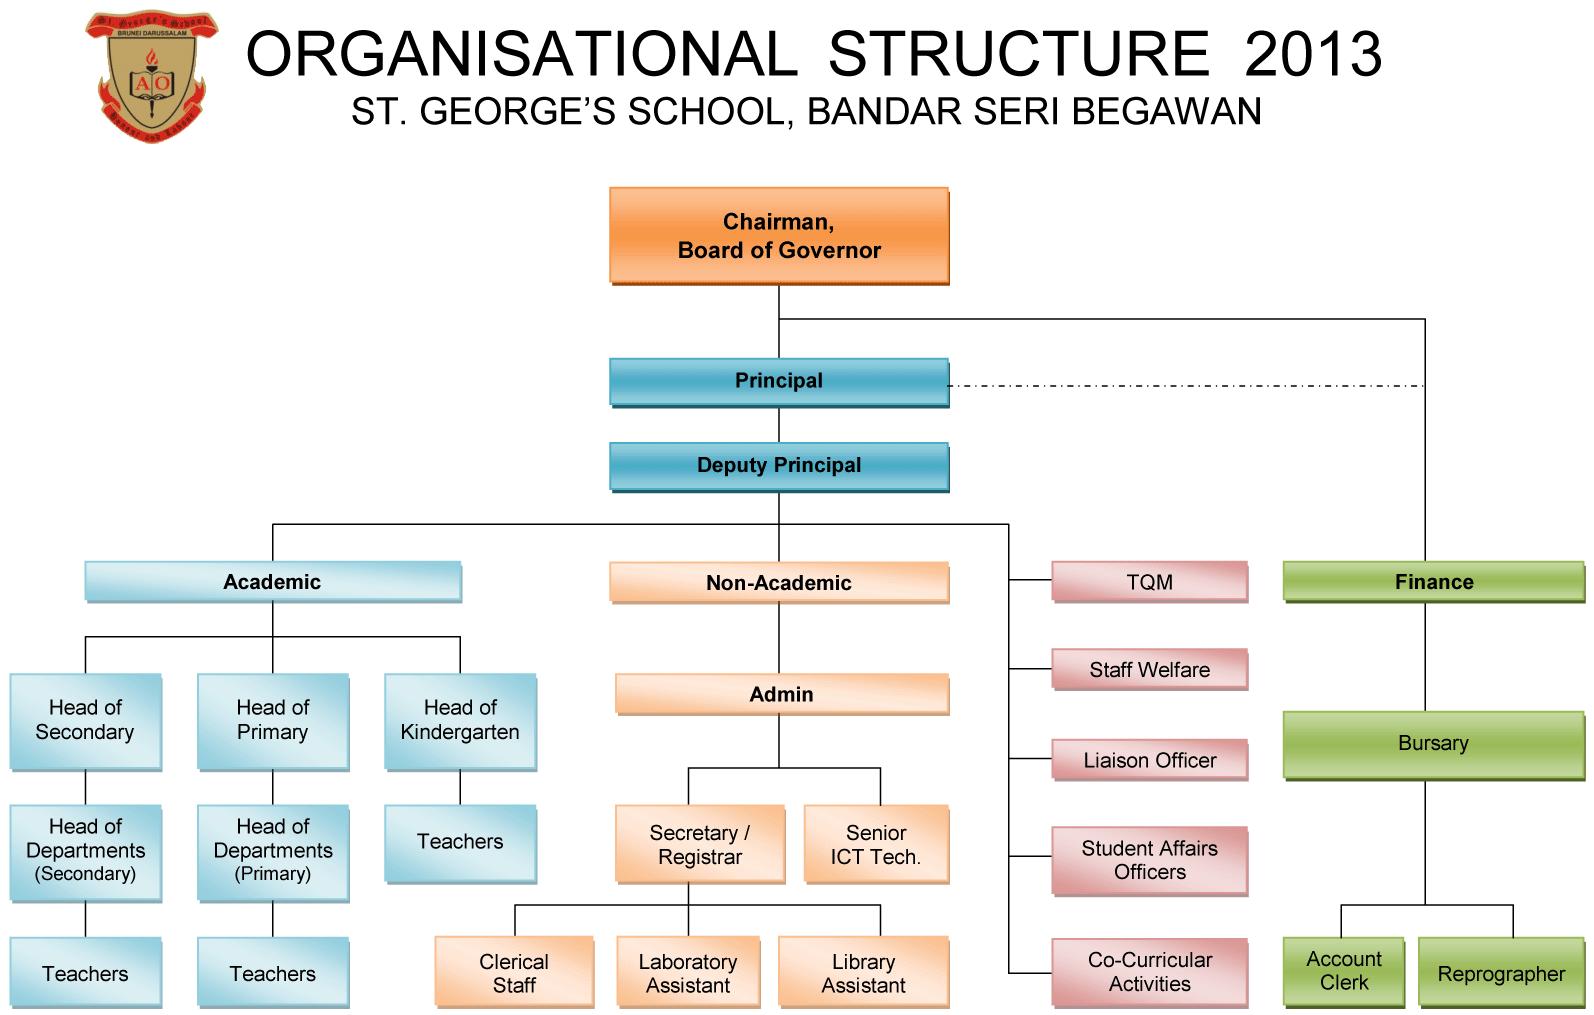 Office Layout Template Organisation Chart St George S School Brunei Darussalam